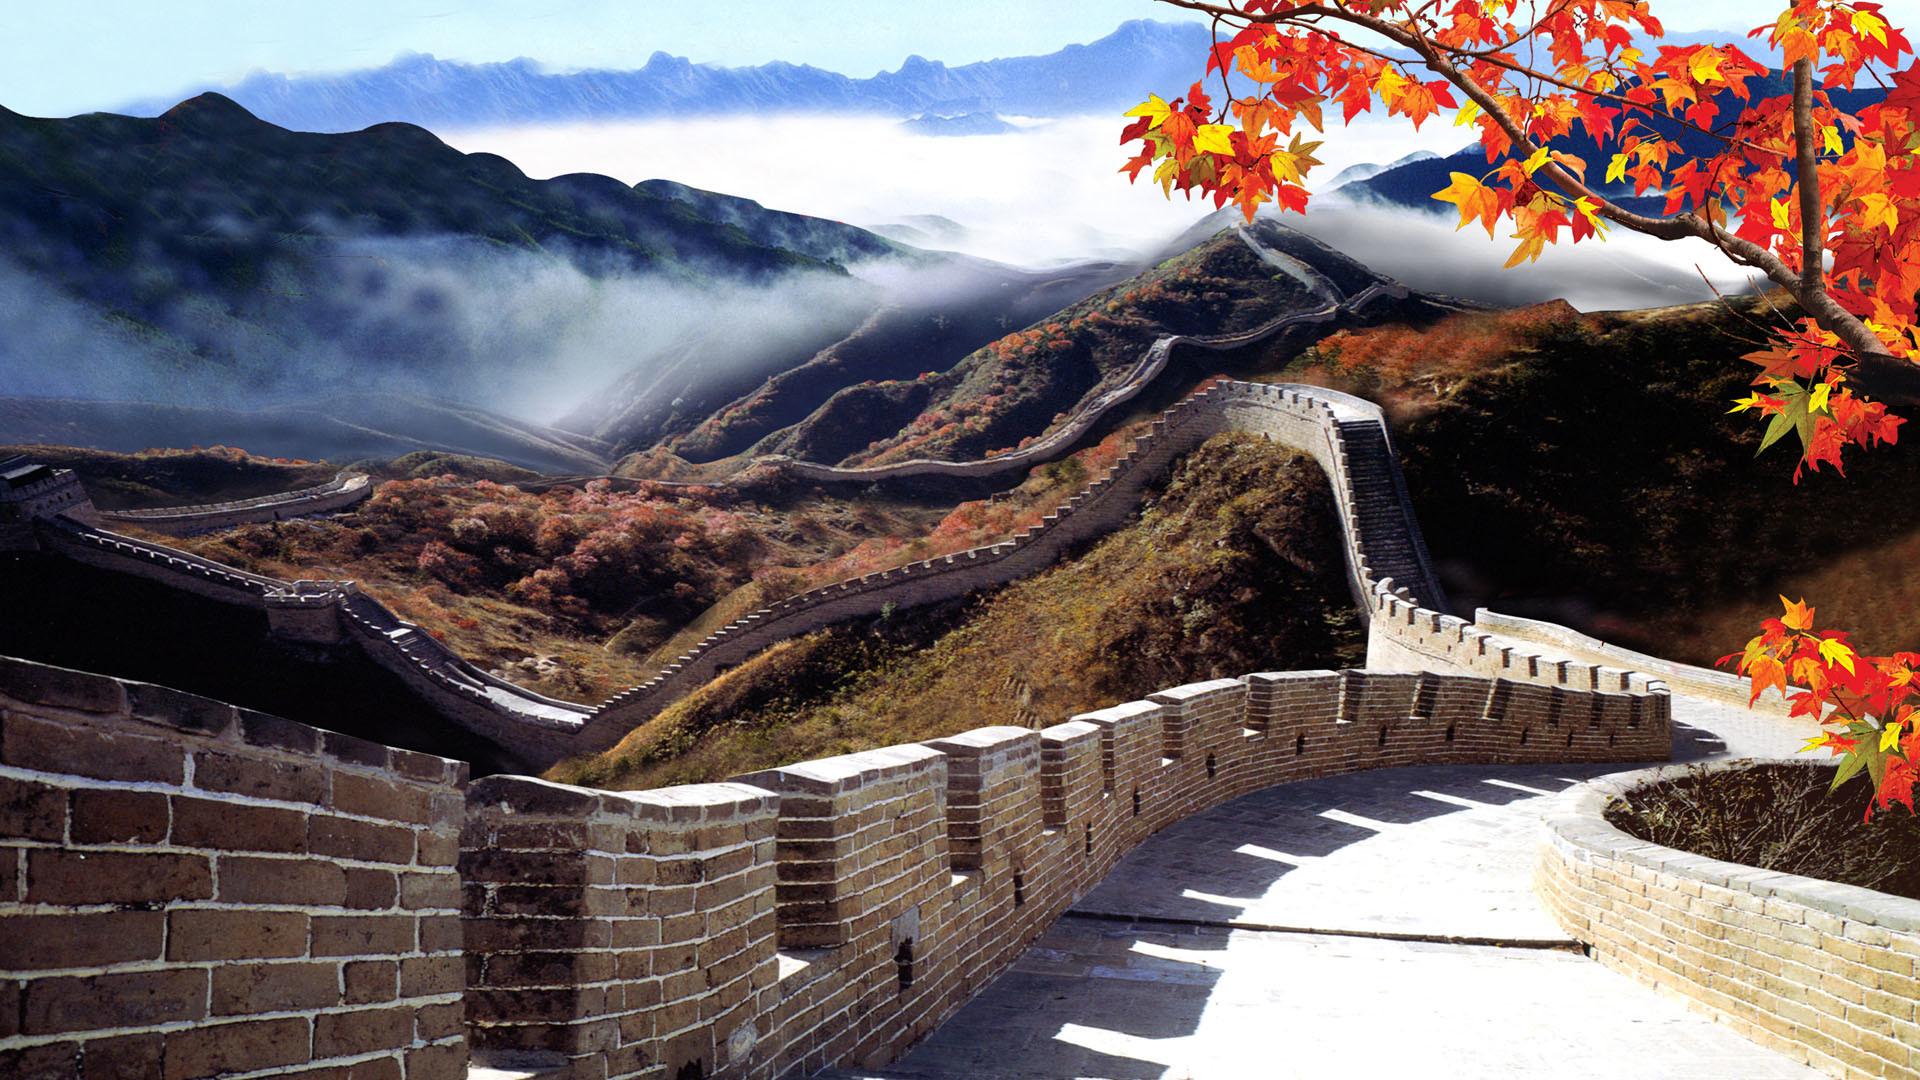 Great wall of china clipart at night svg royalty free The Great Wall of China Wallpaper (51+ images) svg royalty free